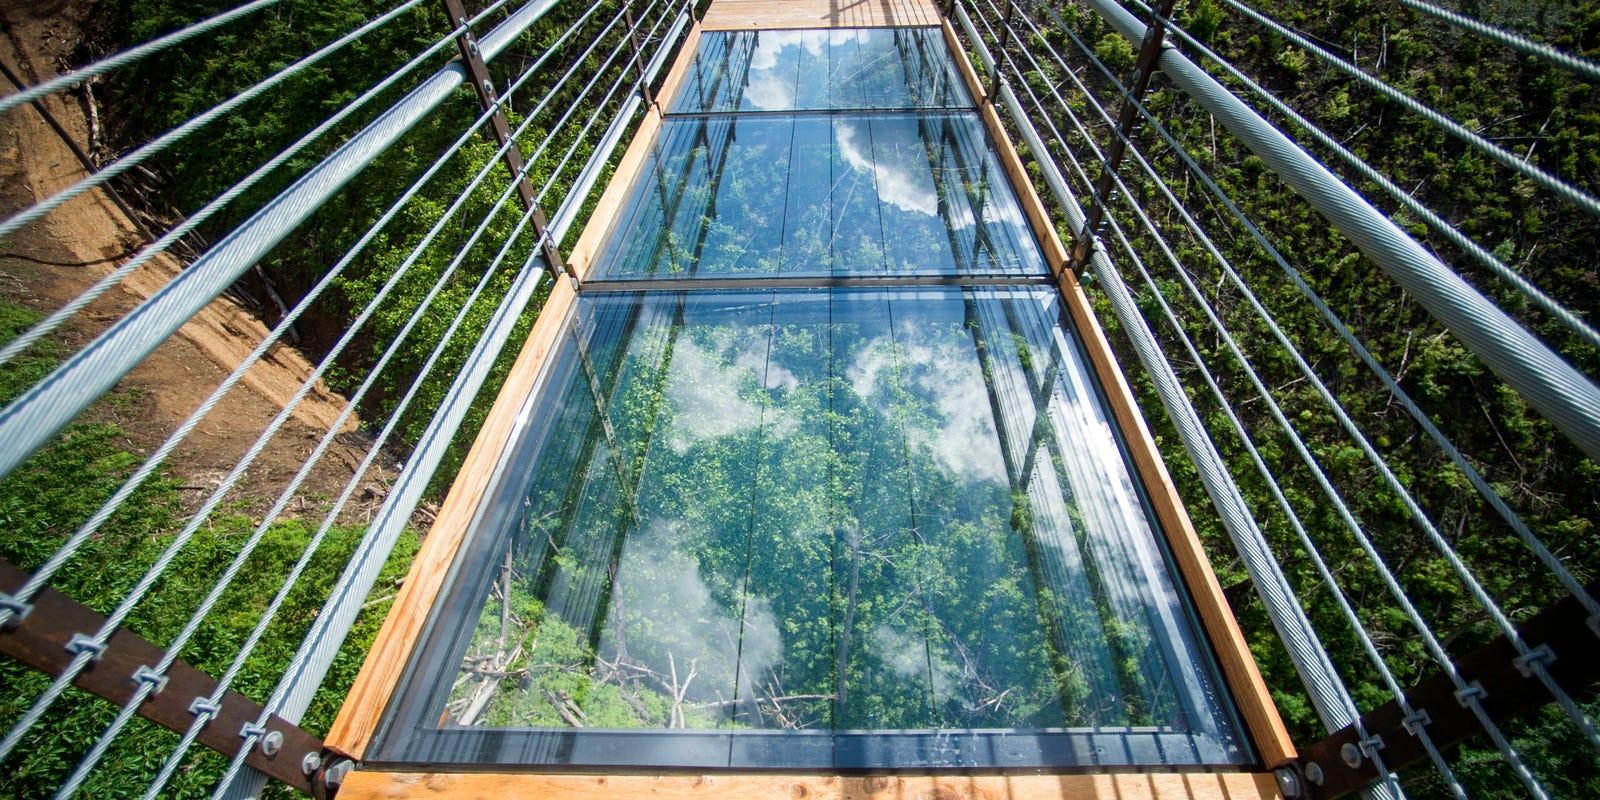 Gatlinburg Skybridge What Made A Glass Panel Crack